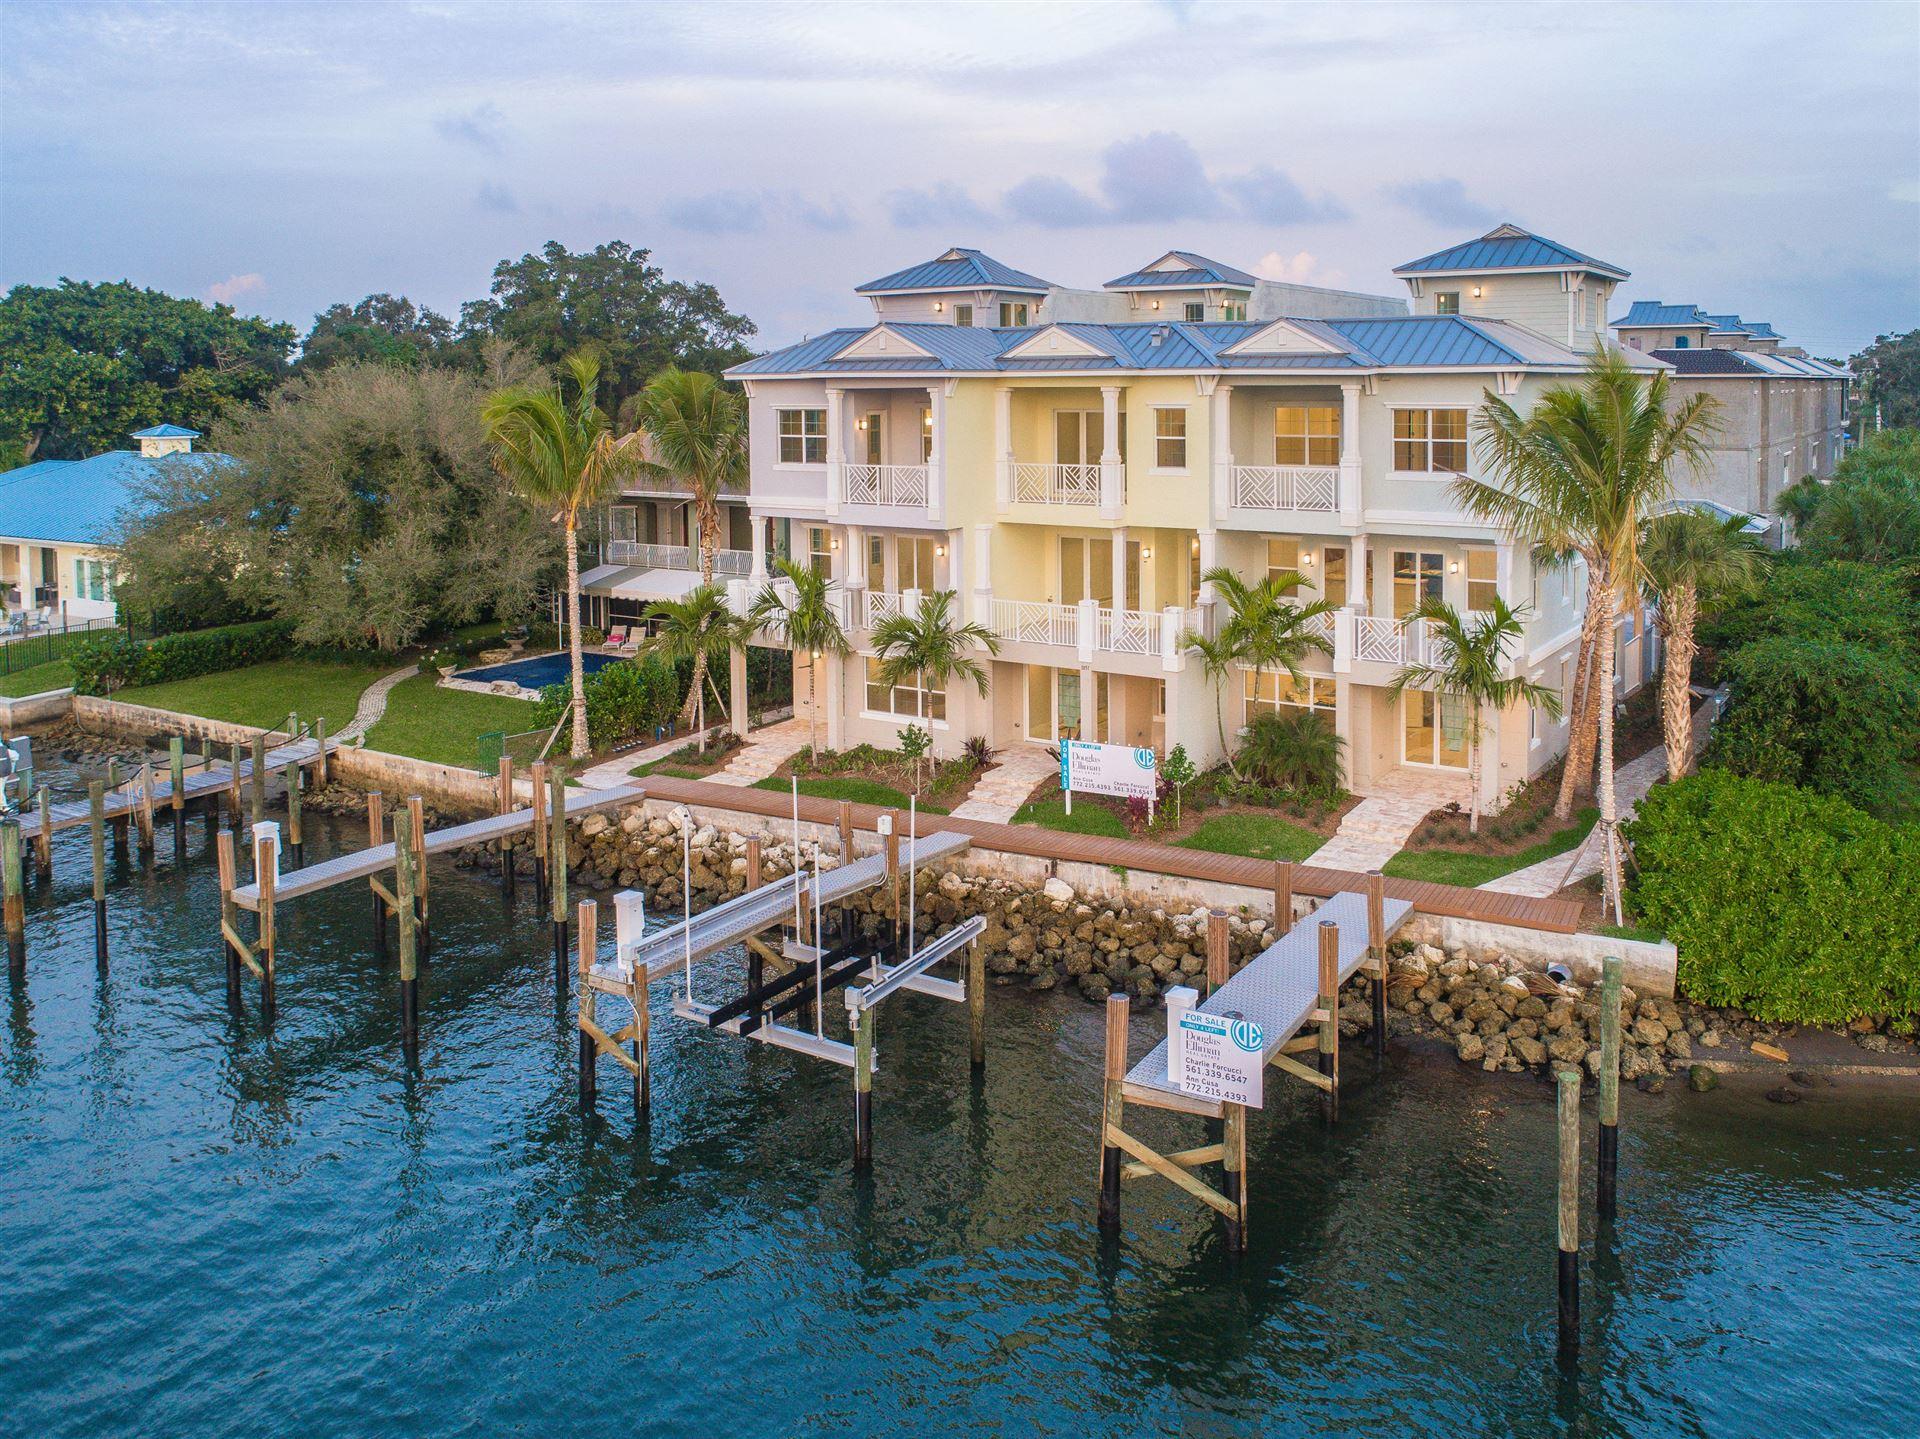 Photo for 1057 Harbor Villas Drive #1, North Palm Beach, FL 33408 (MLS # RX-10323855)